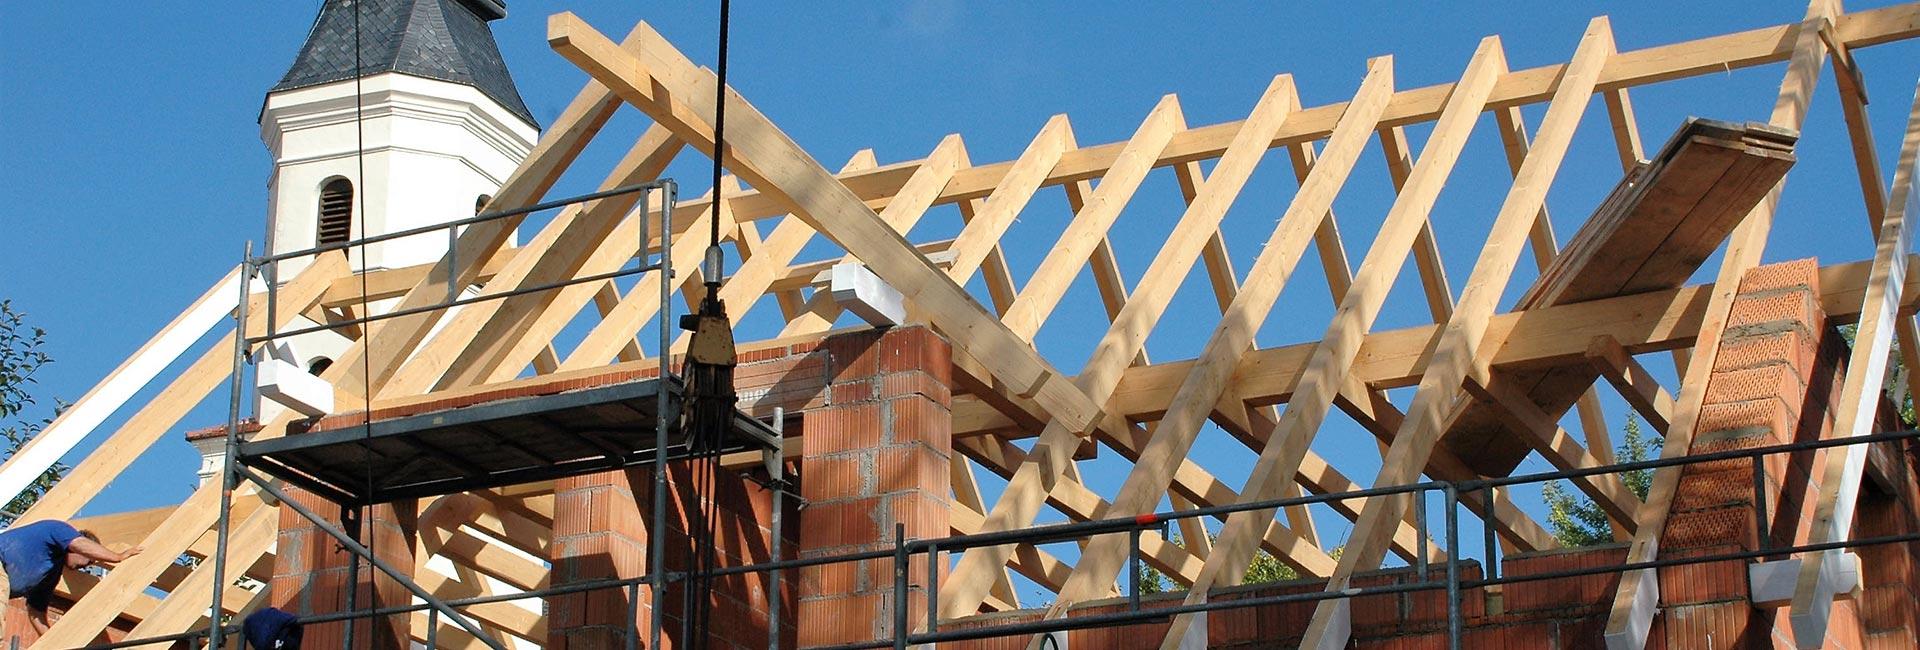 Neubauten, Massivbauten, Altbausanierung, Rohbauten und Umbauten bei Landshut